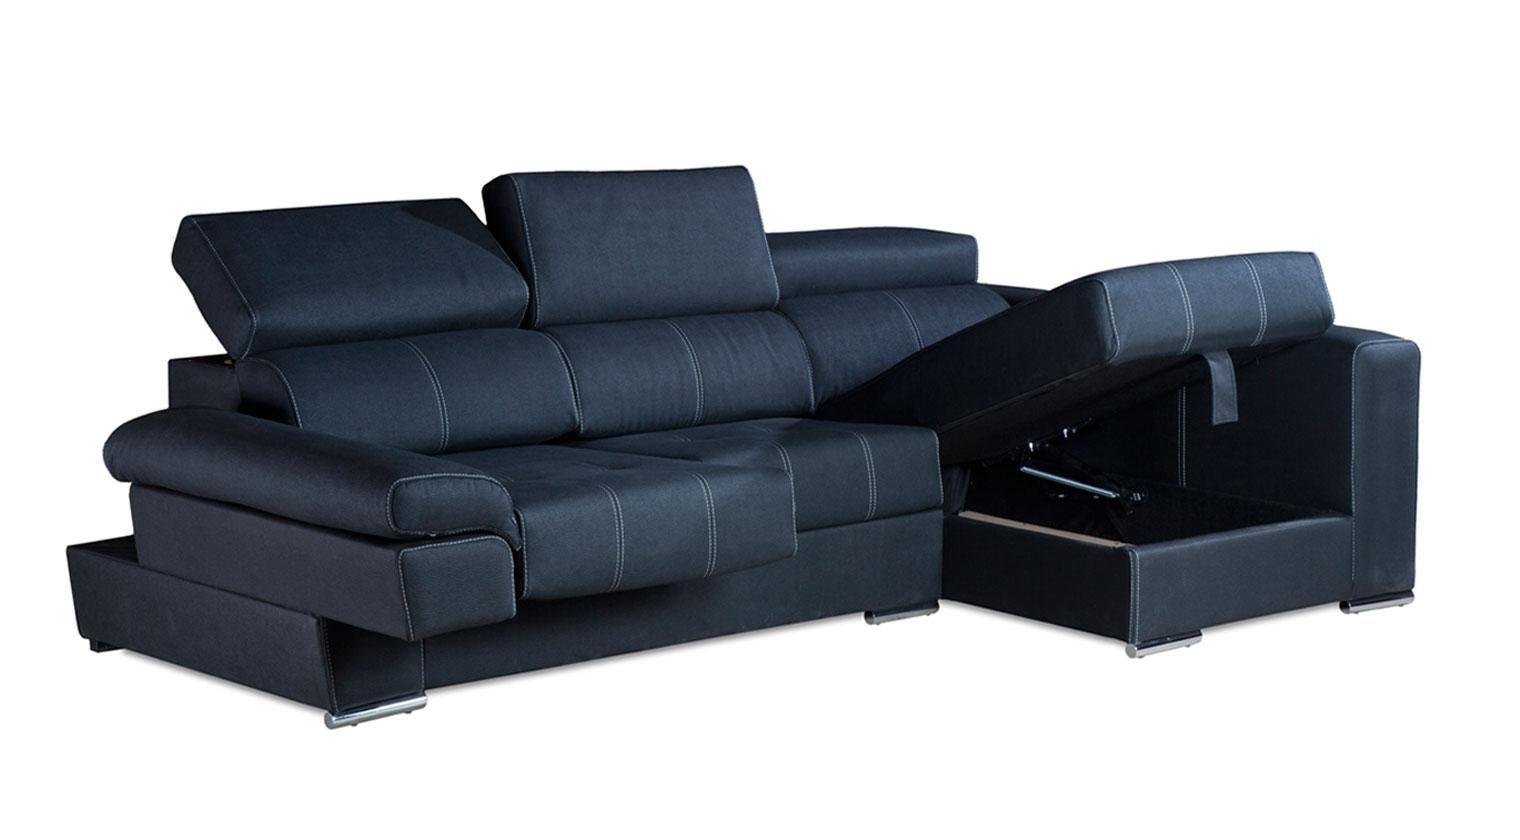 Comprar chaise longue valencia sofa 3 plazas microfibra mozart for Sofas baratos murcia